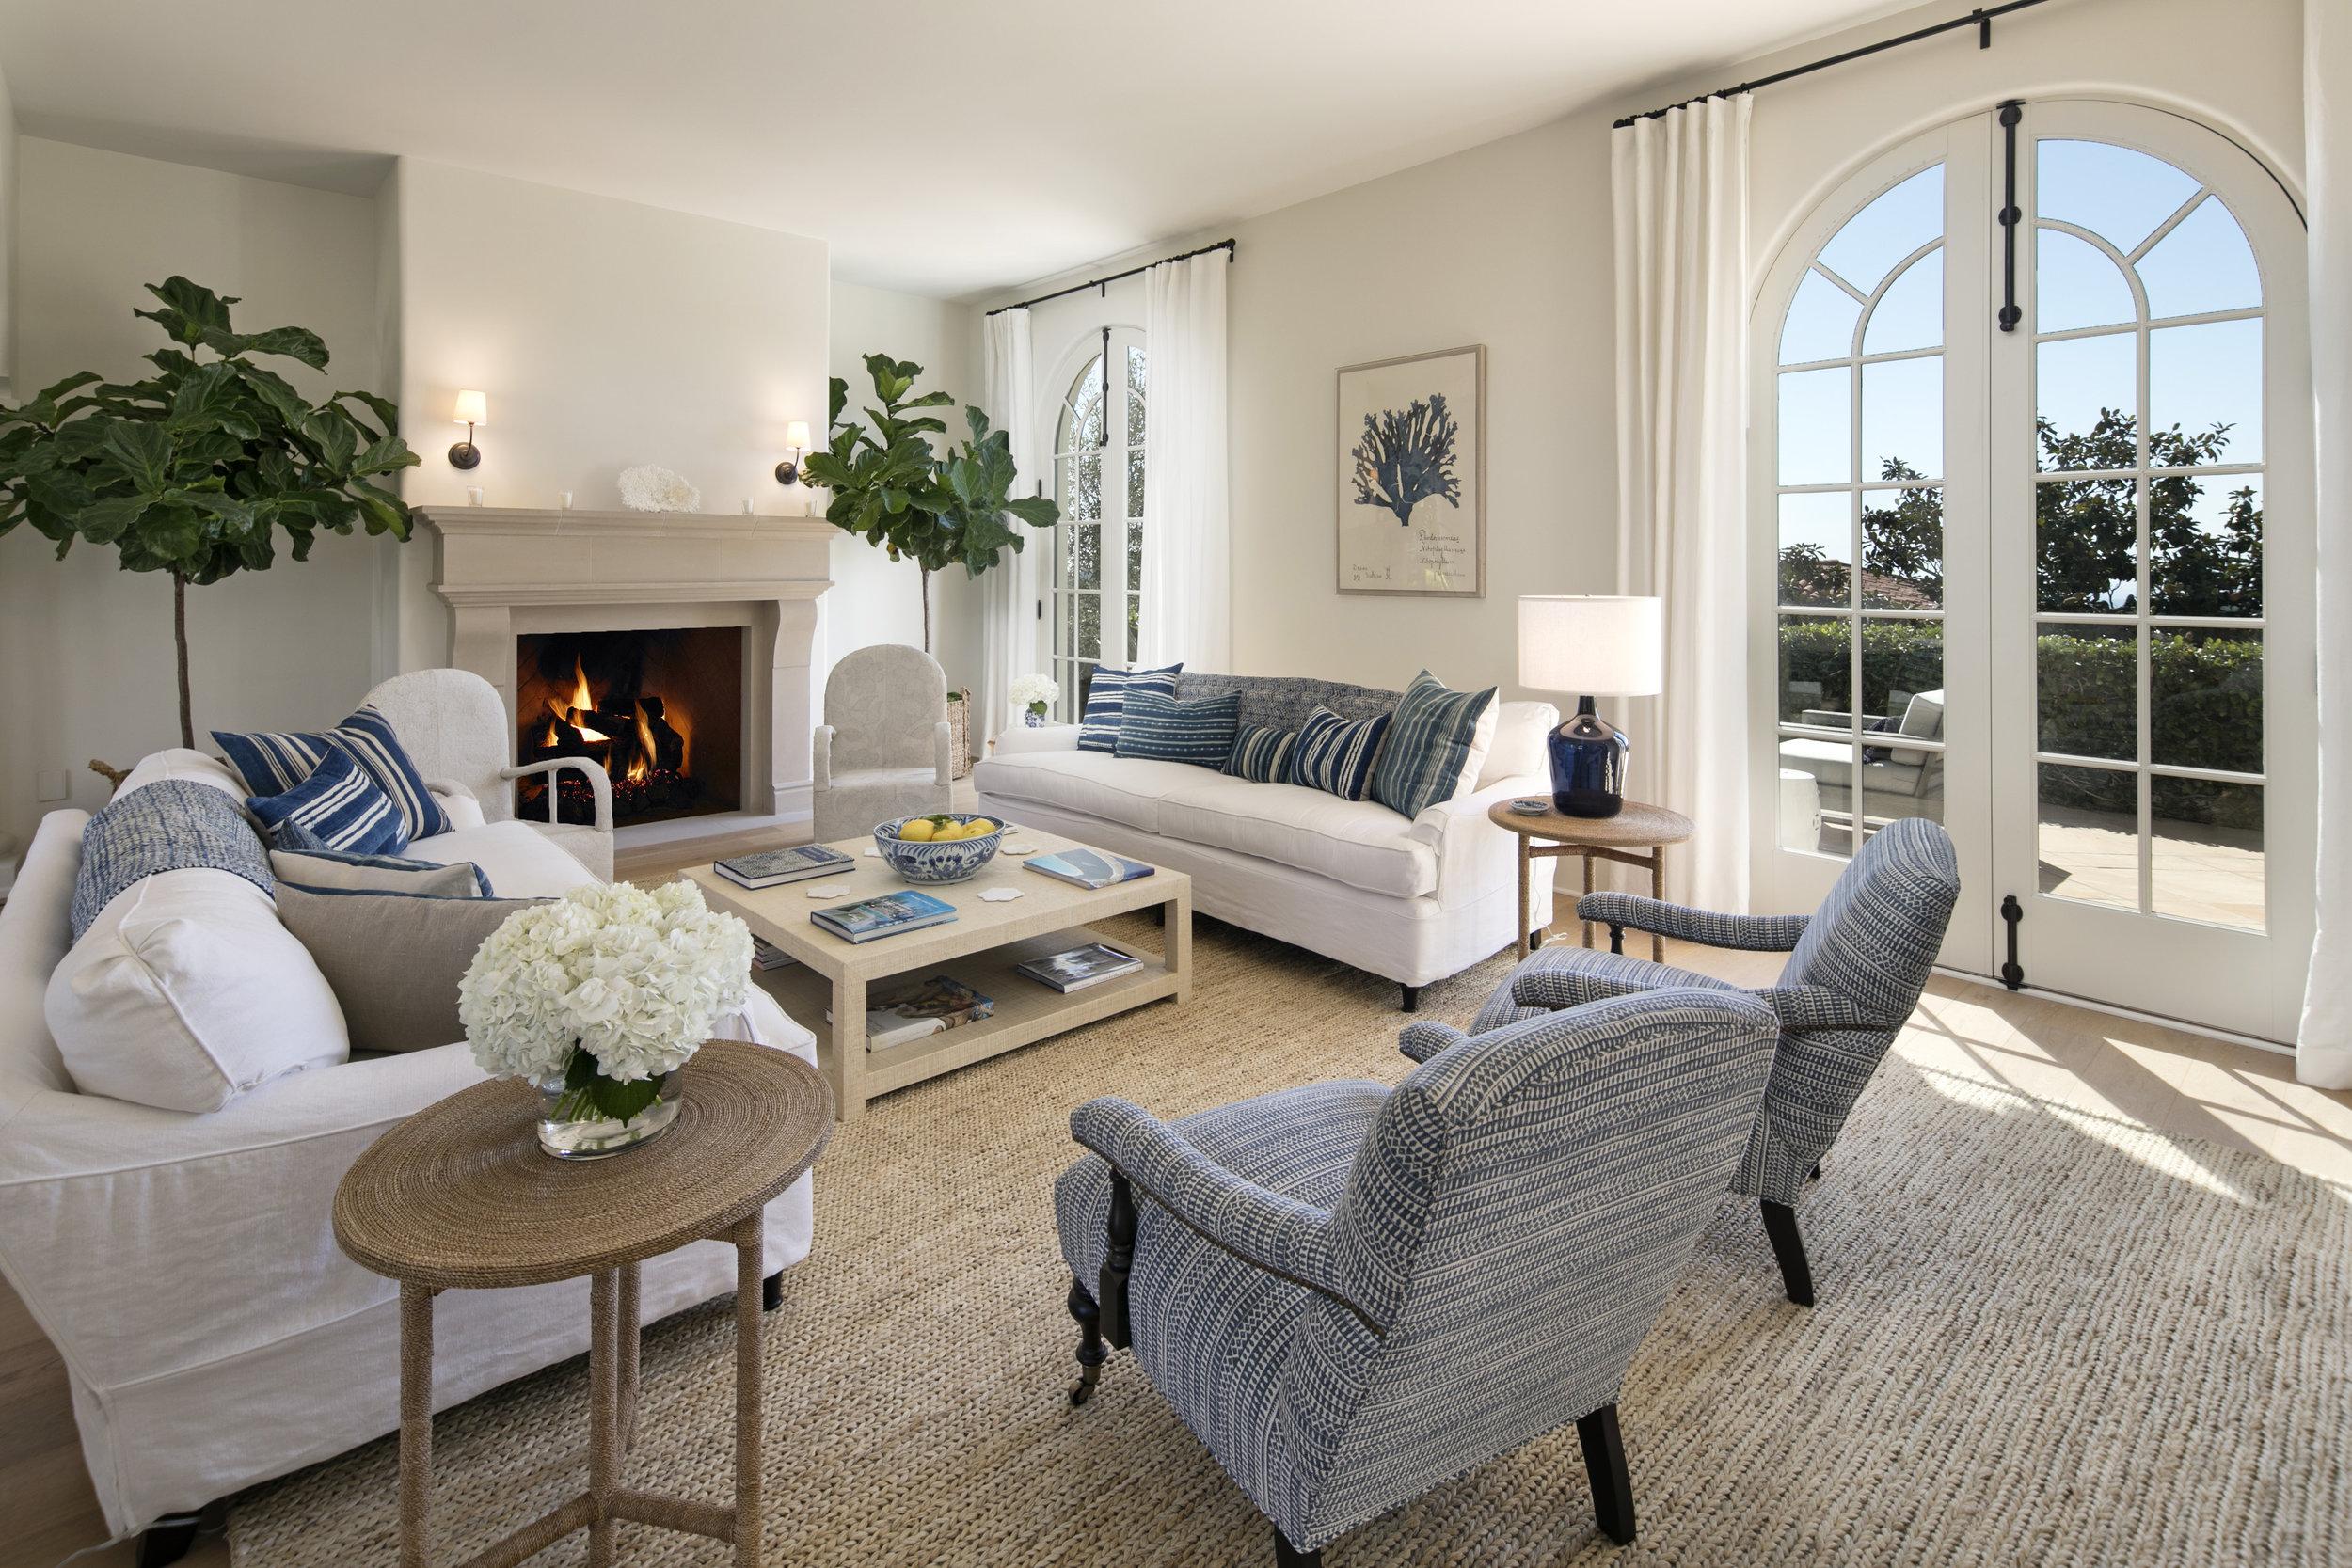 Rooms+Gardens+Interior+Design+Bristol+Sofa.jpeg